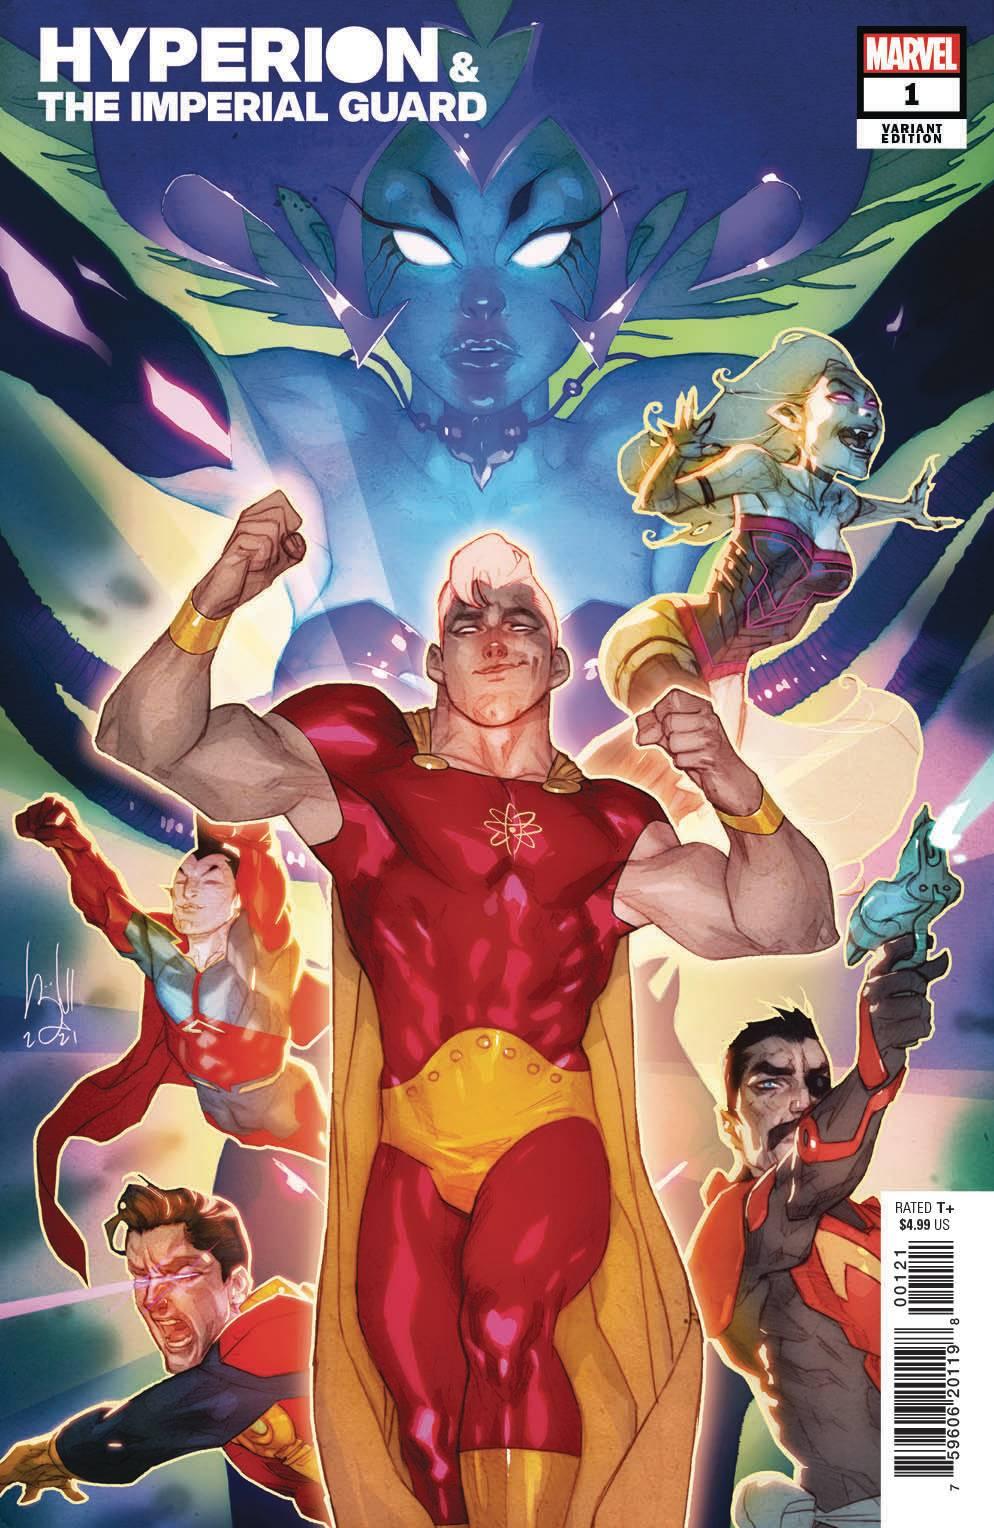 STL185537 ComicList: Marvel Comics New Releases for 05/12/2021